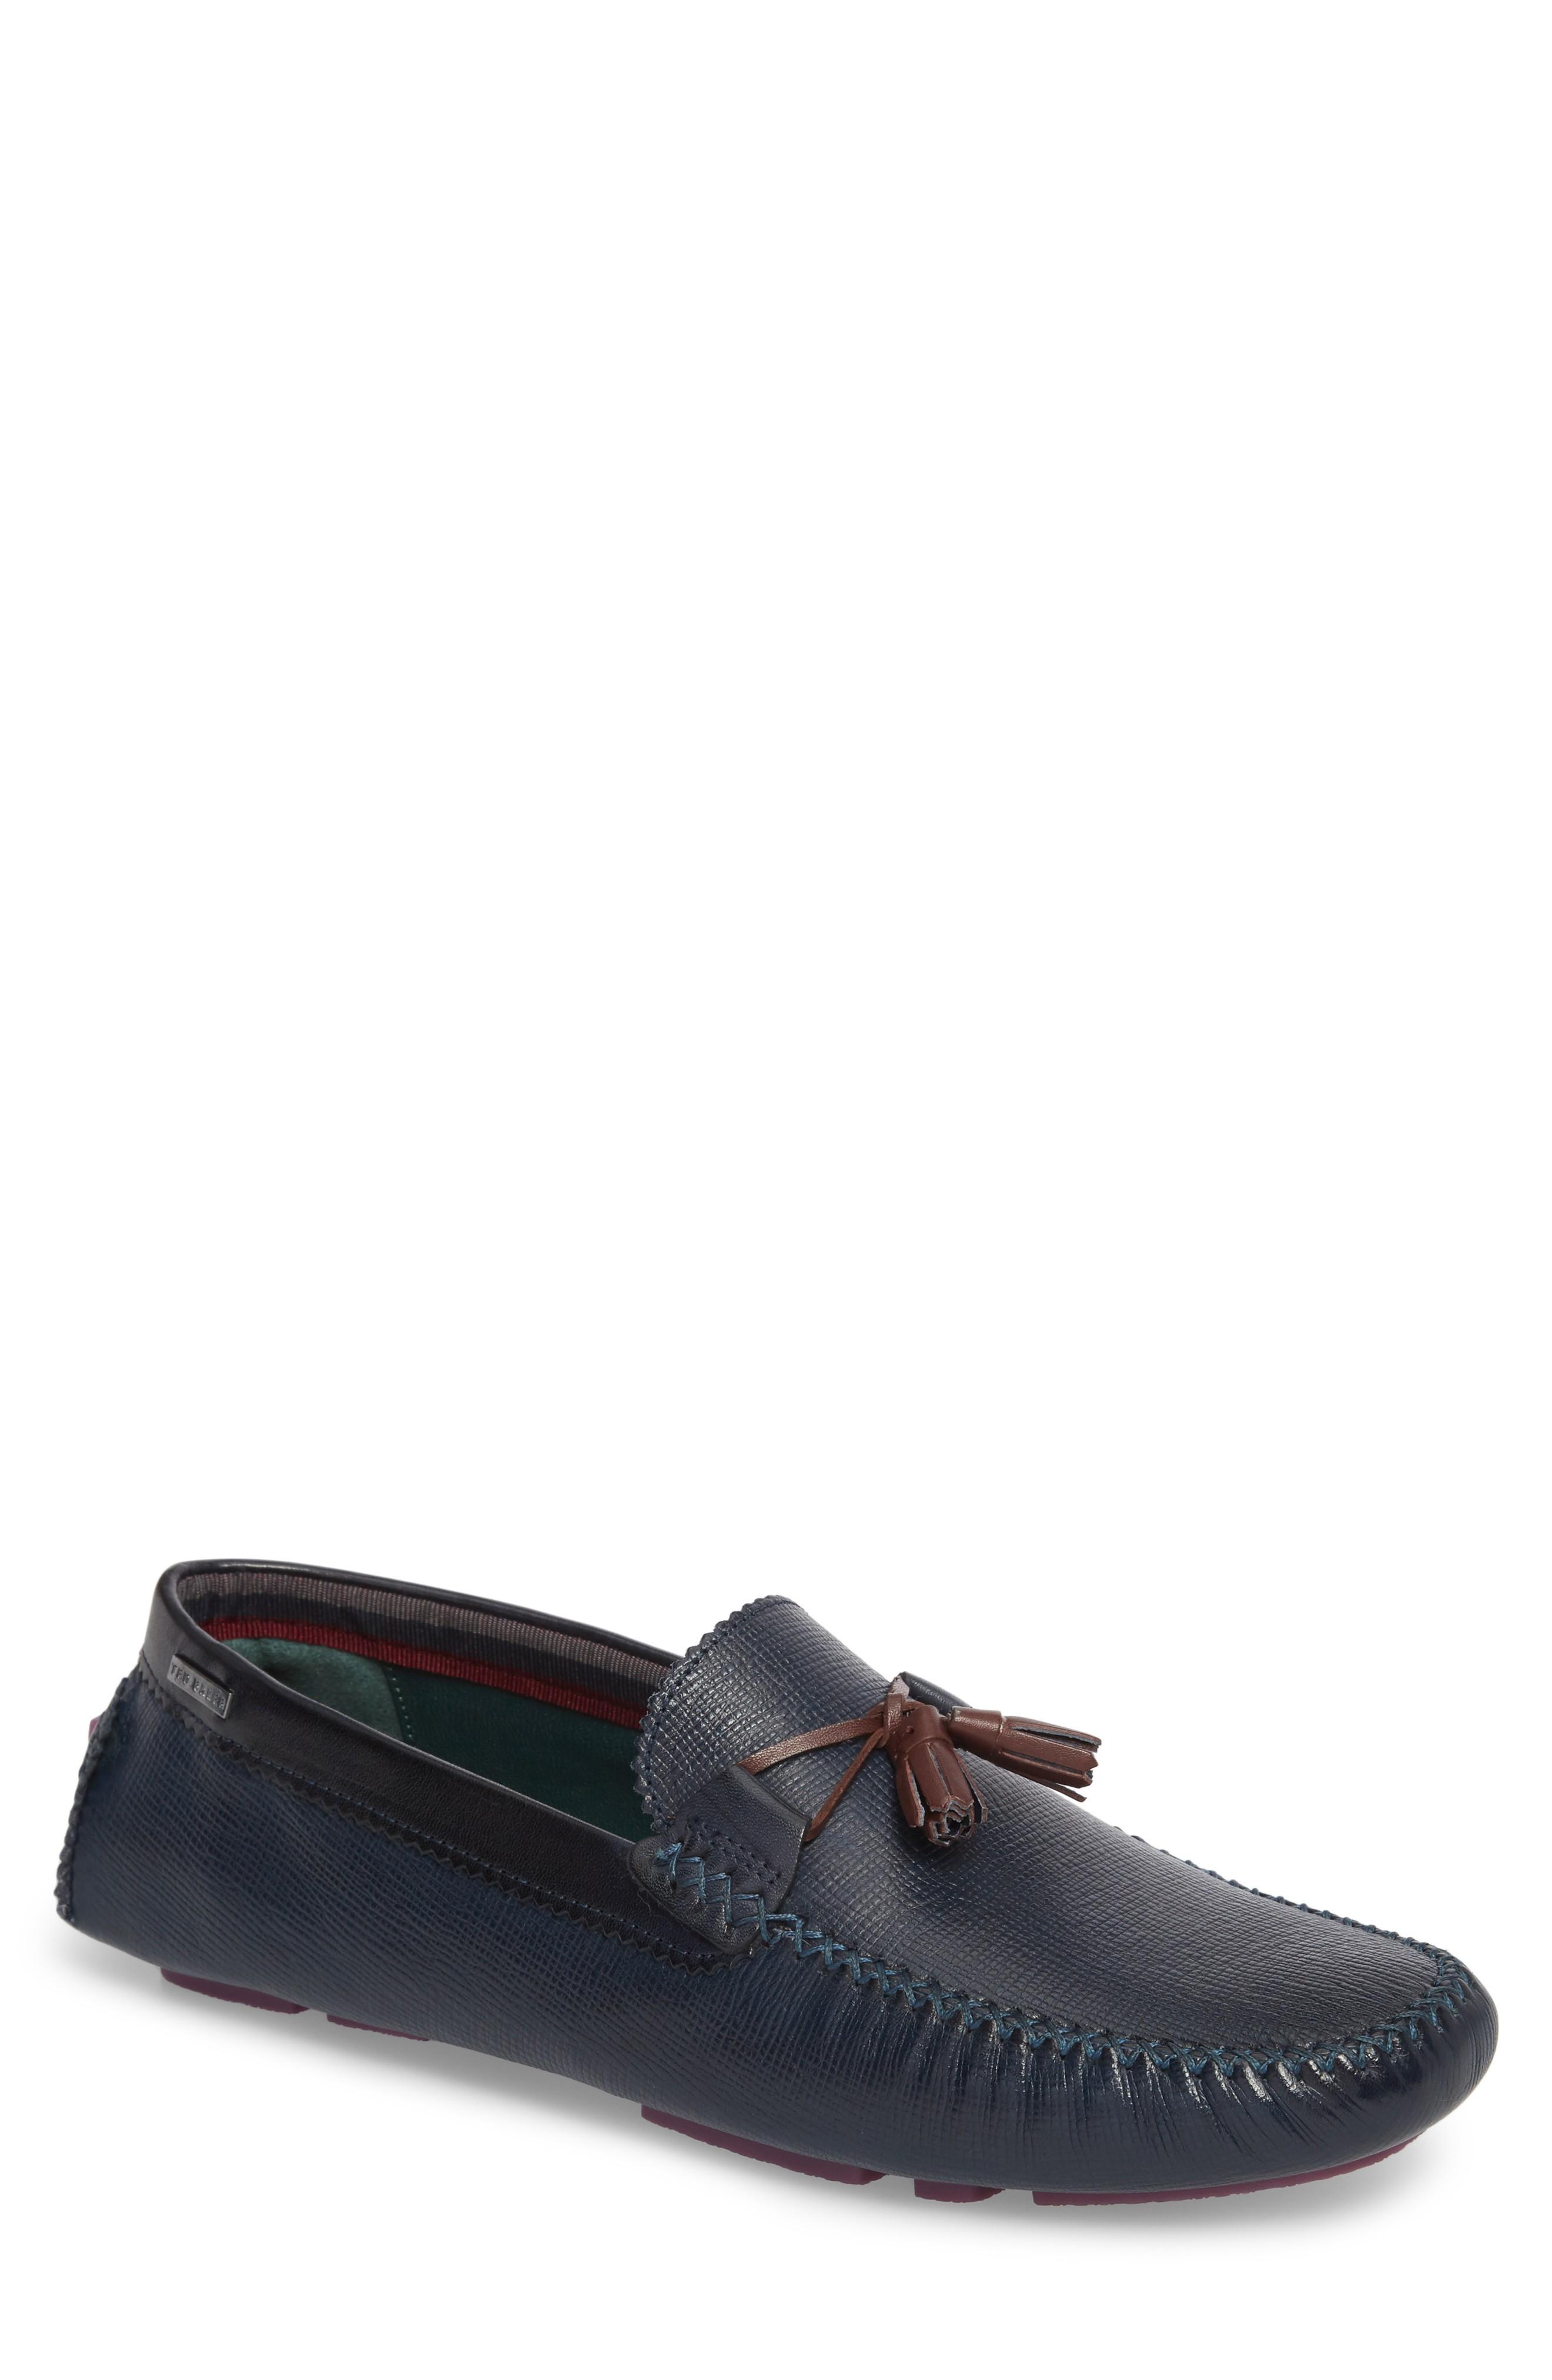 54337f7f512 Ted Baker Urbonn Tasseled Driving Loafer In Dark Blue Leather